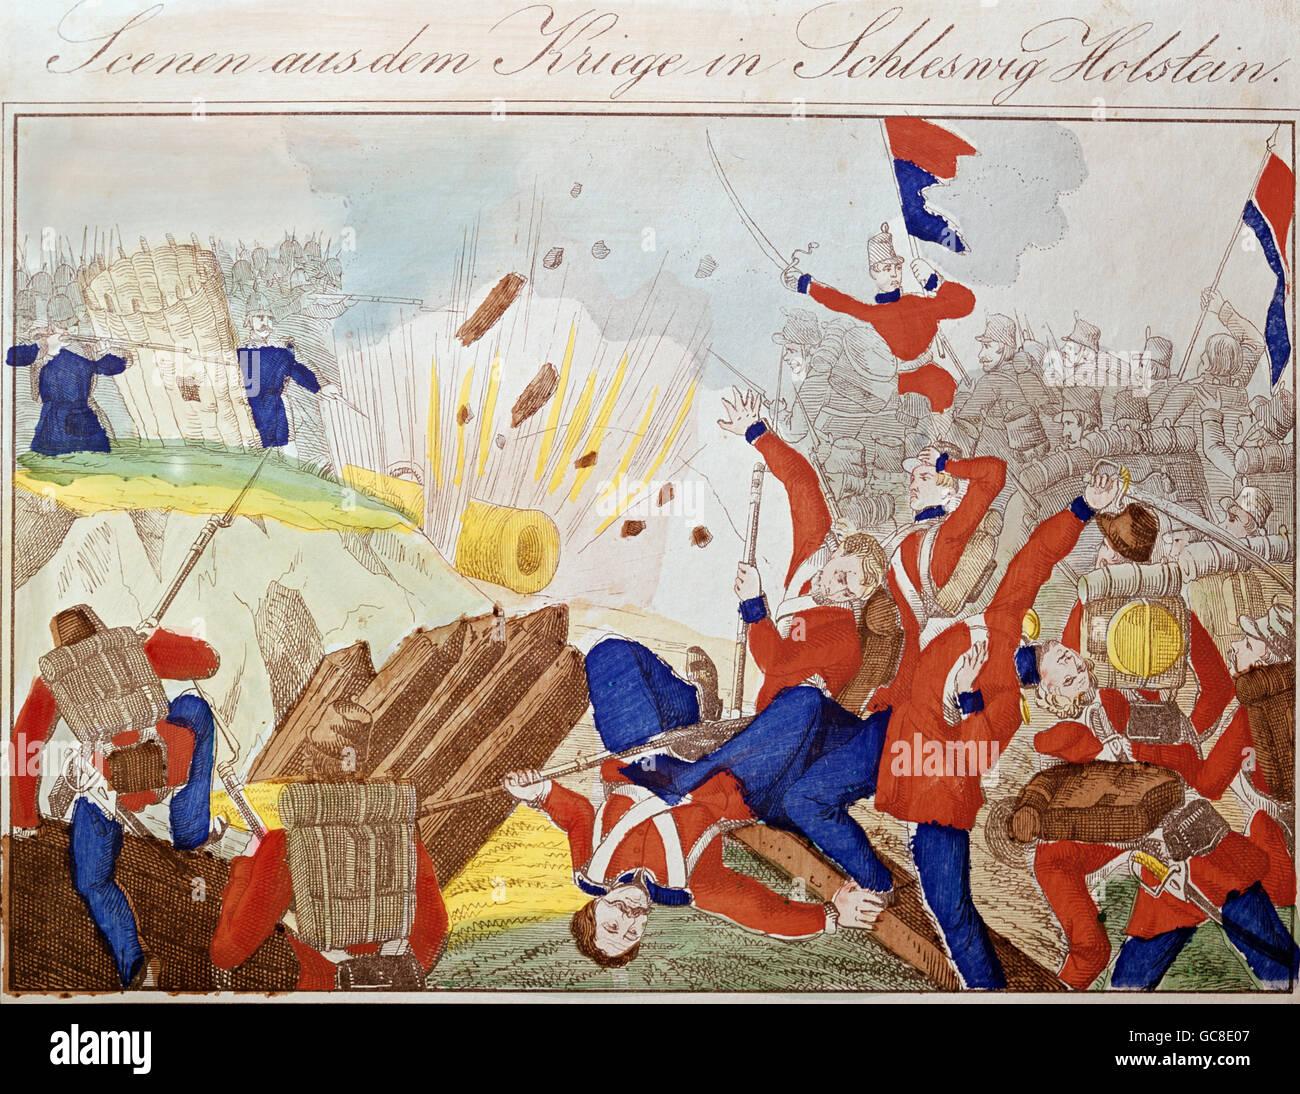 Events First Schleswig War 1848 1850 Skirmish Between